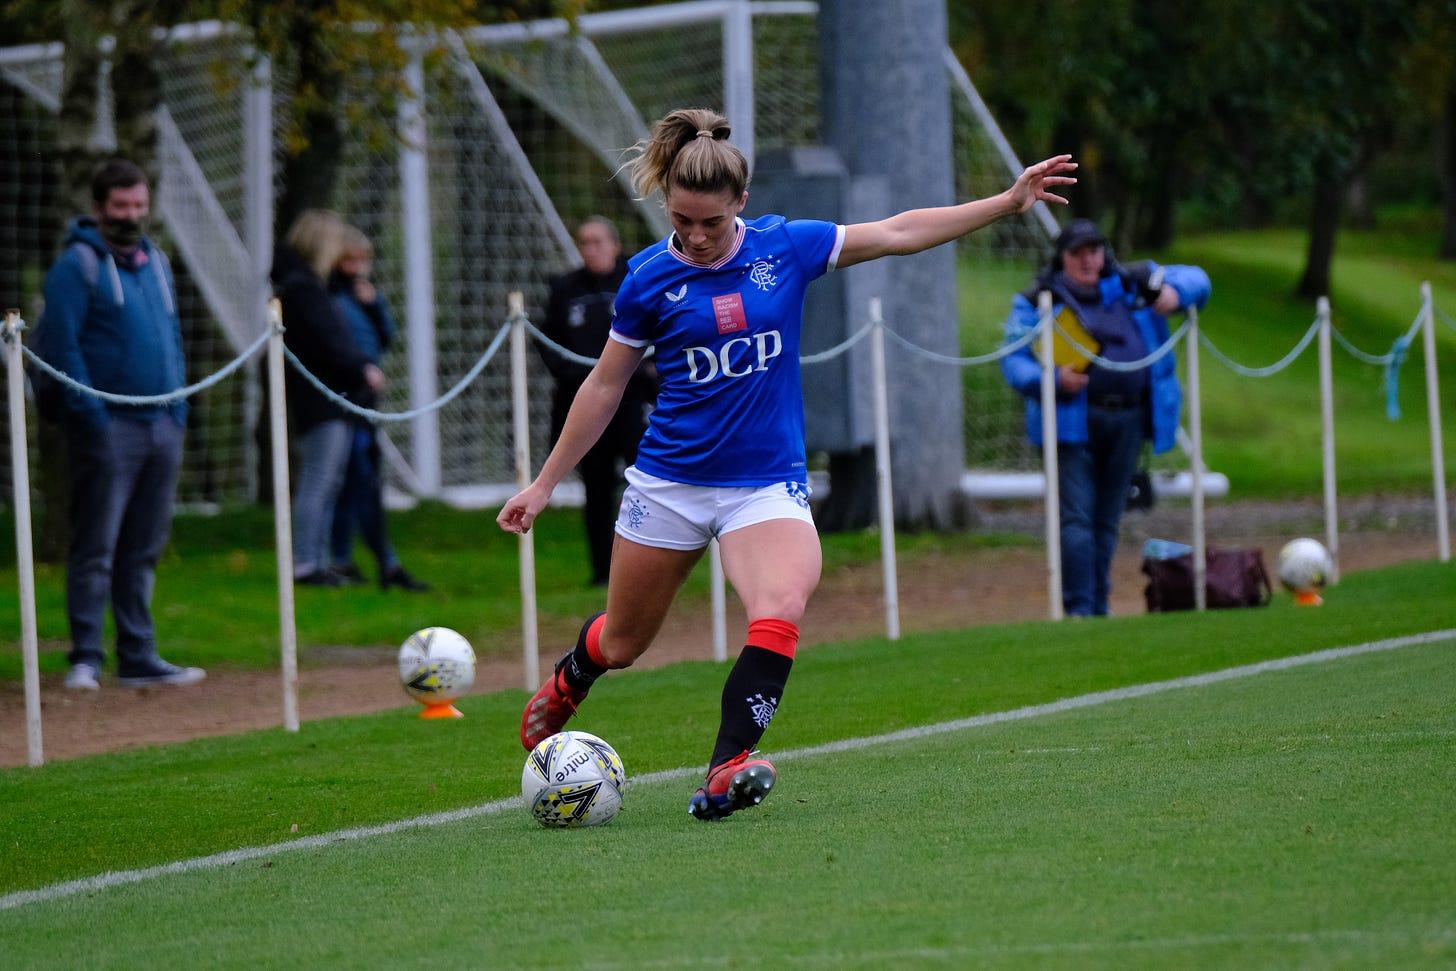 Rangers' midfielder Chelsea Cornet